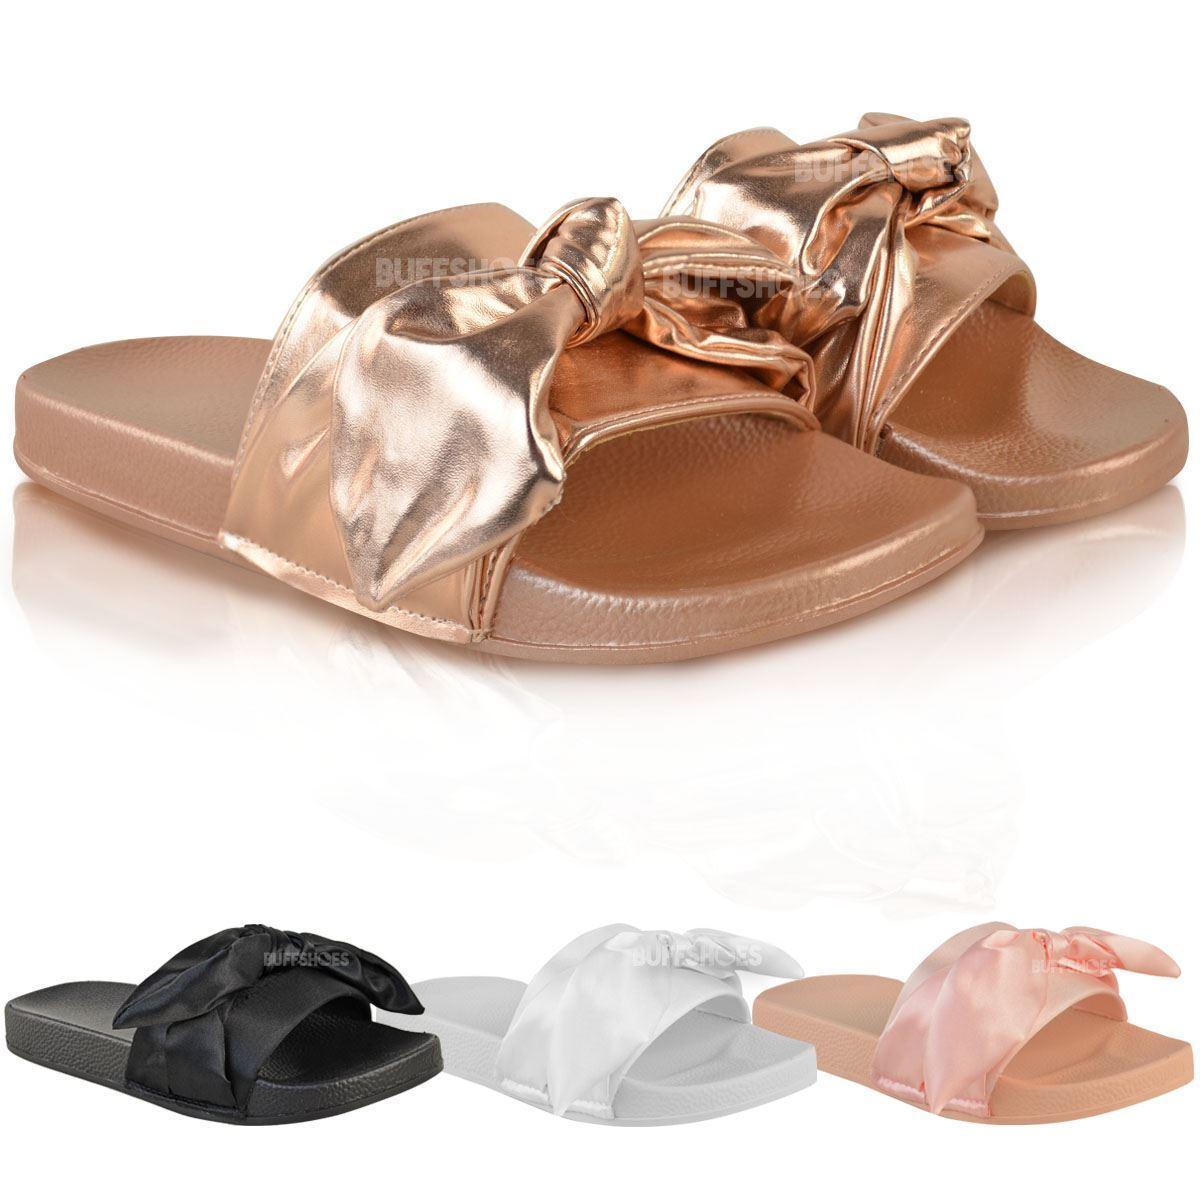 Womens Ladies Slider Flat Slides Sandals Summer Slip On Mules Slipper Summer Sandals Shoes Size 3aecf1